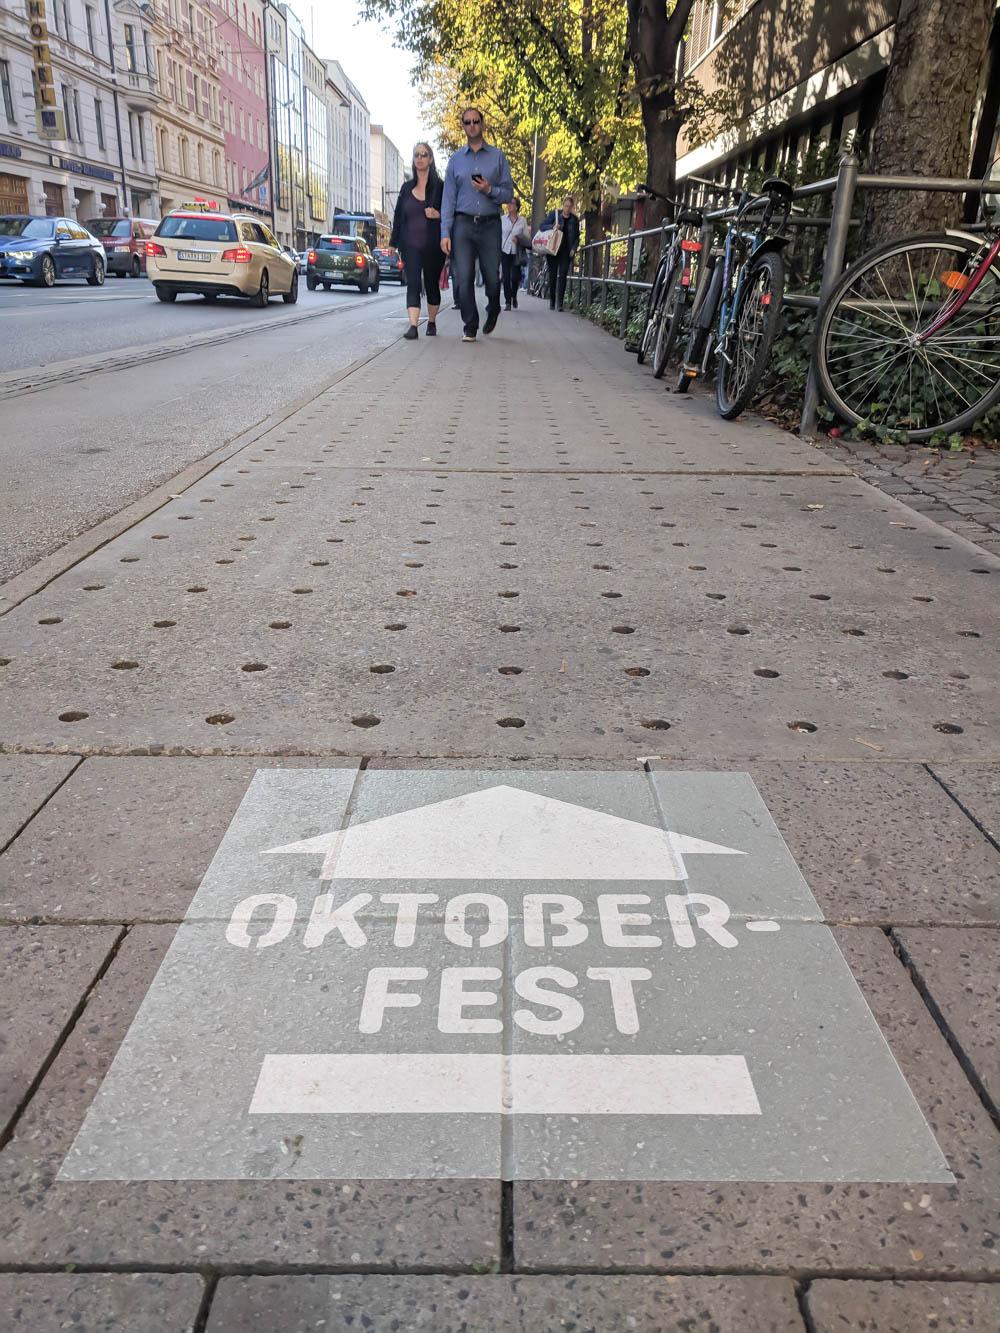 Follow me to Oktoberfest signs